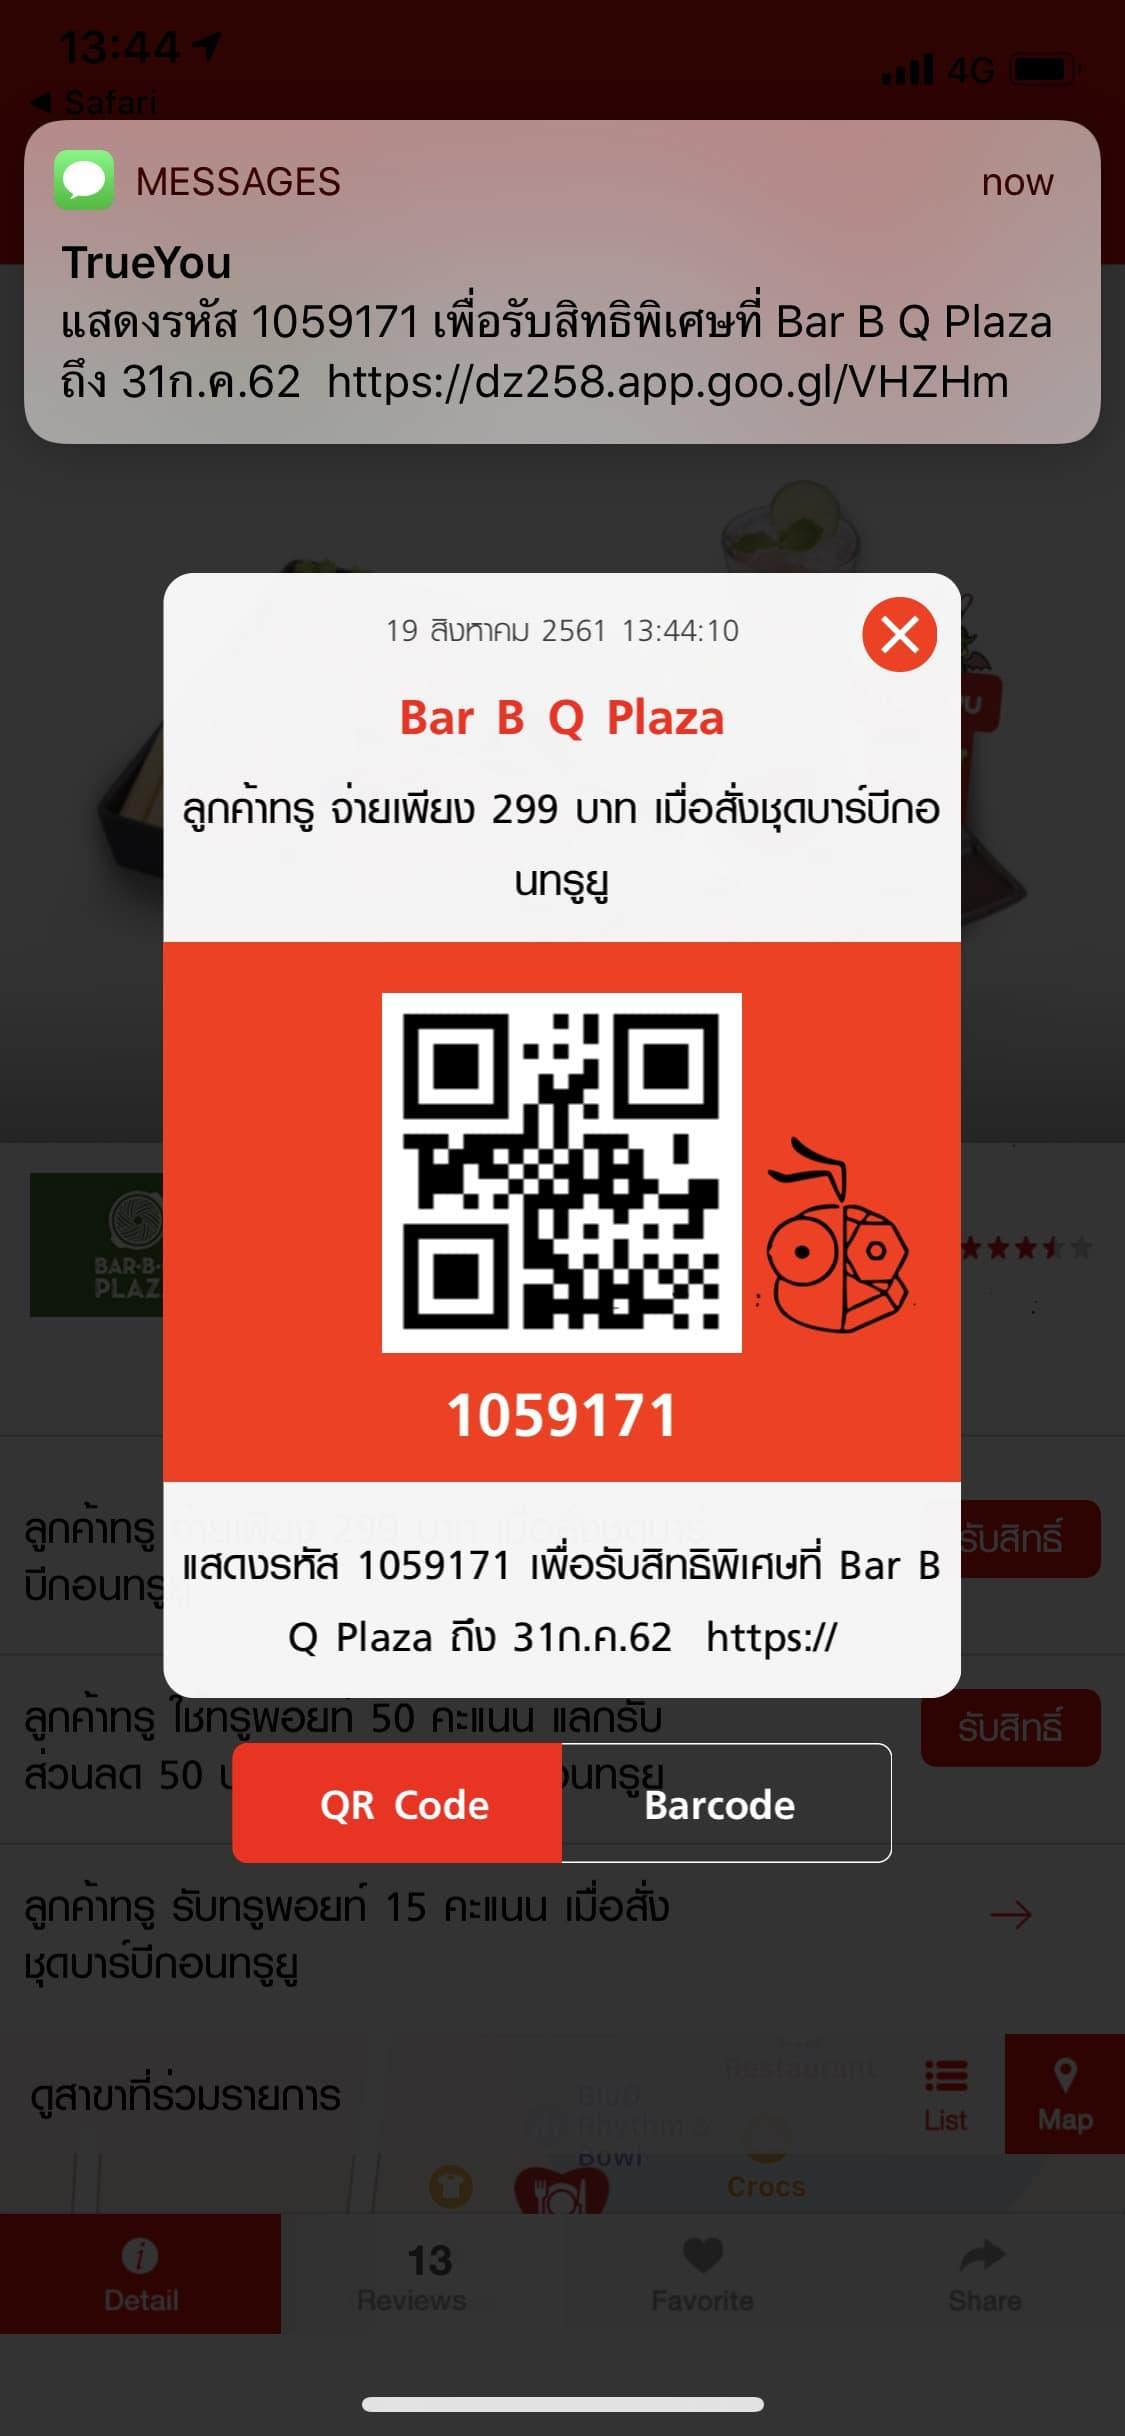 Bar B Q Plaza Trueyou